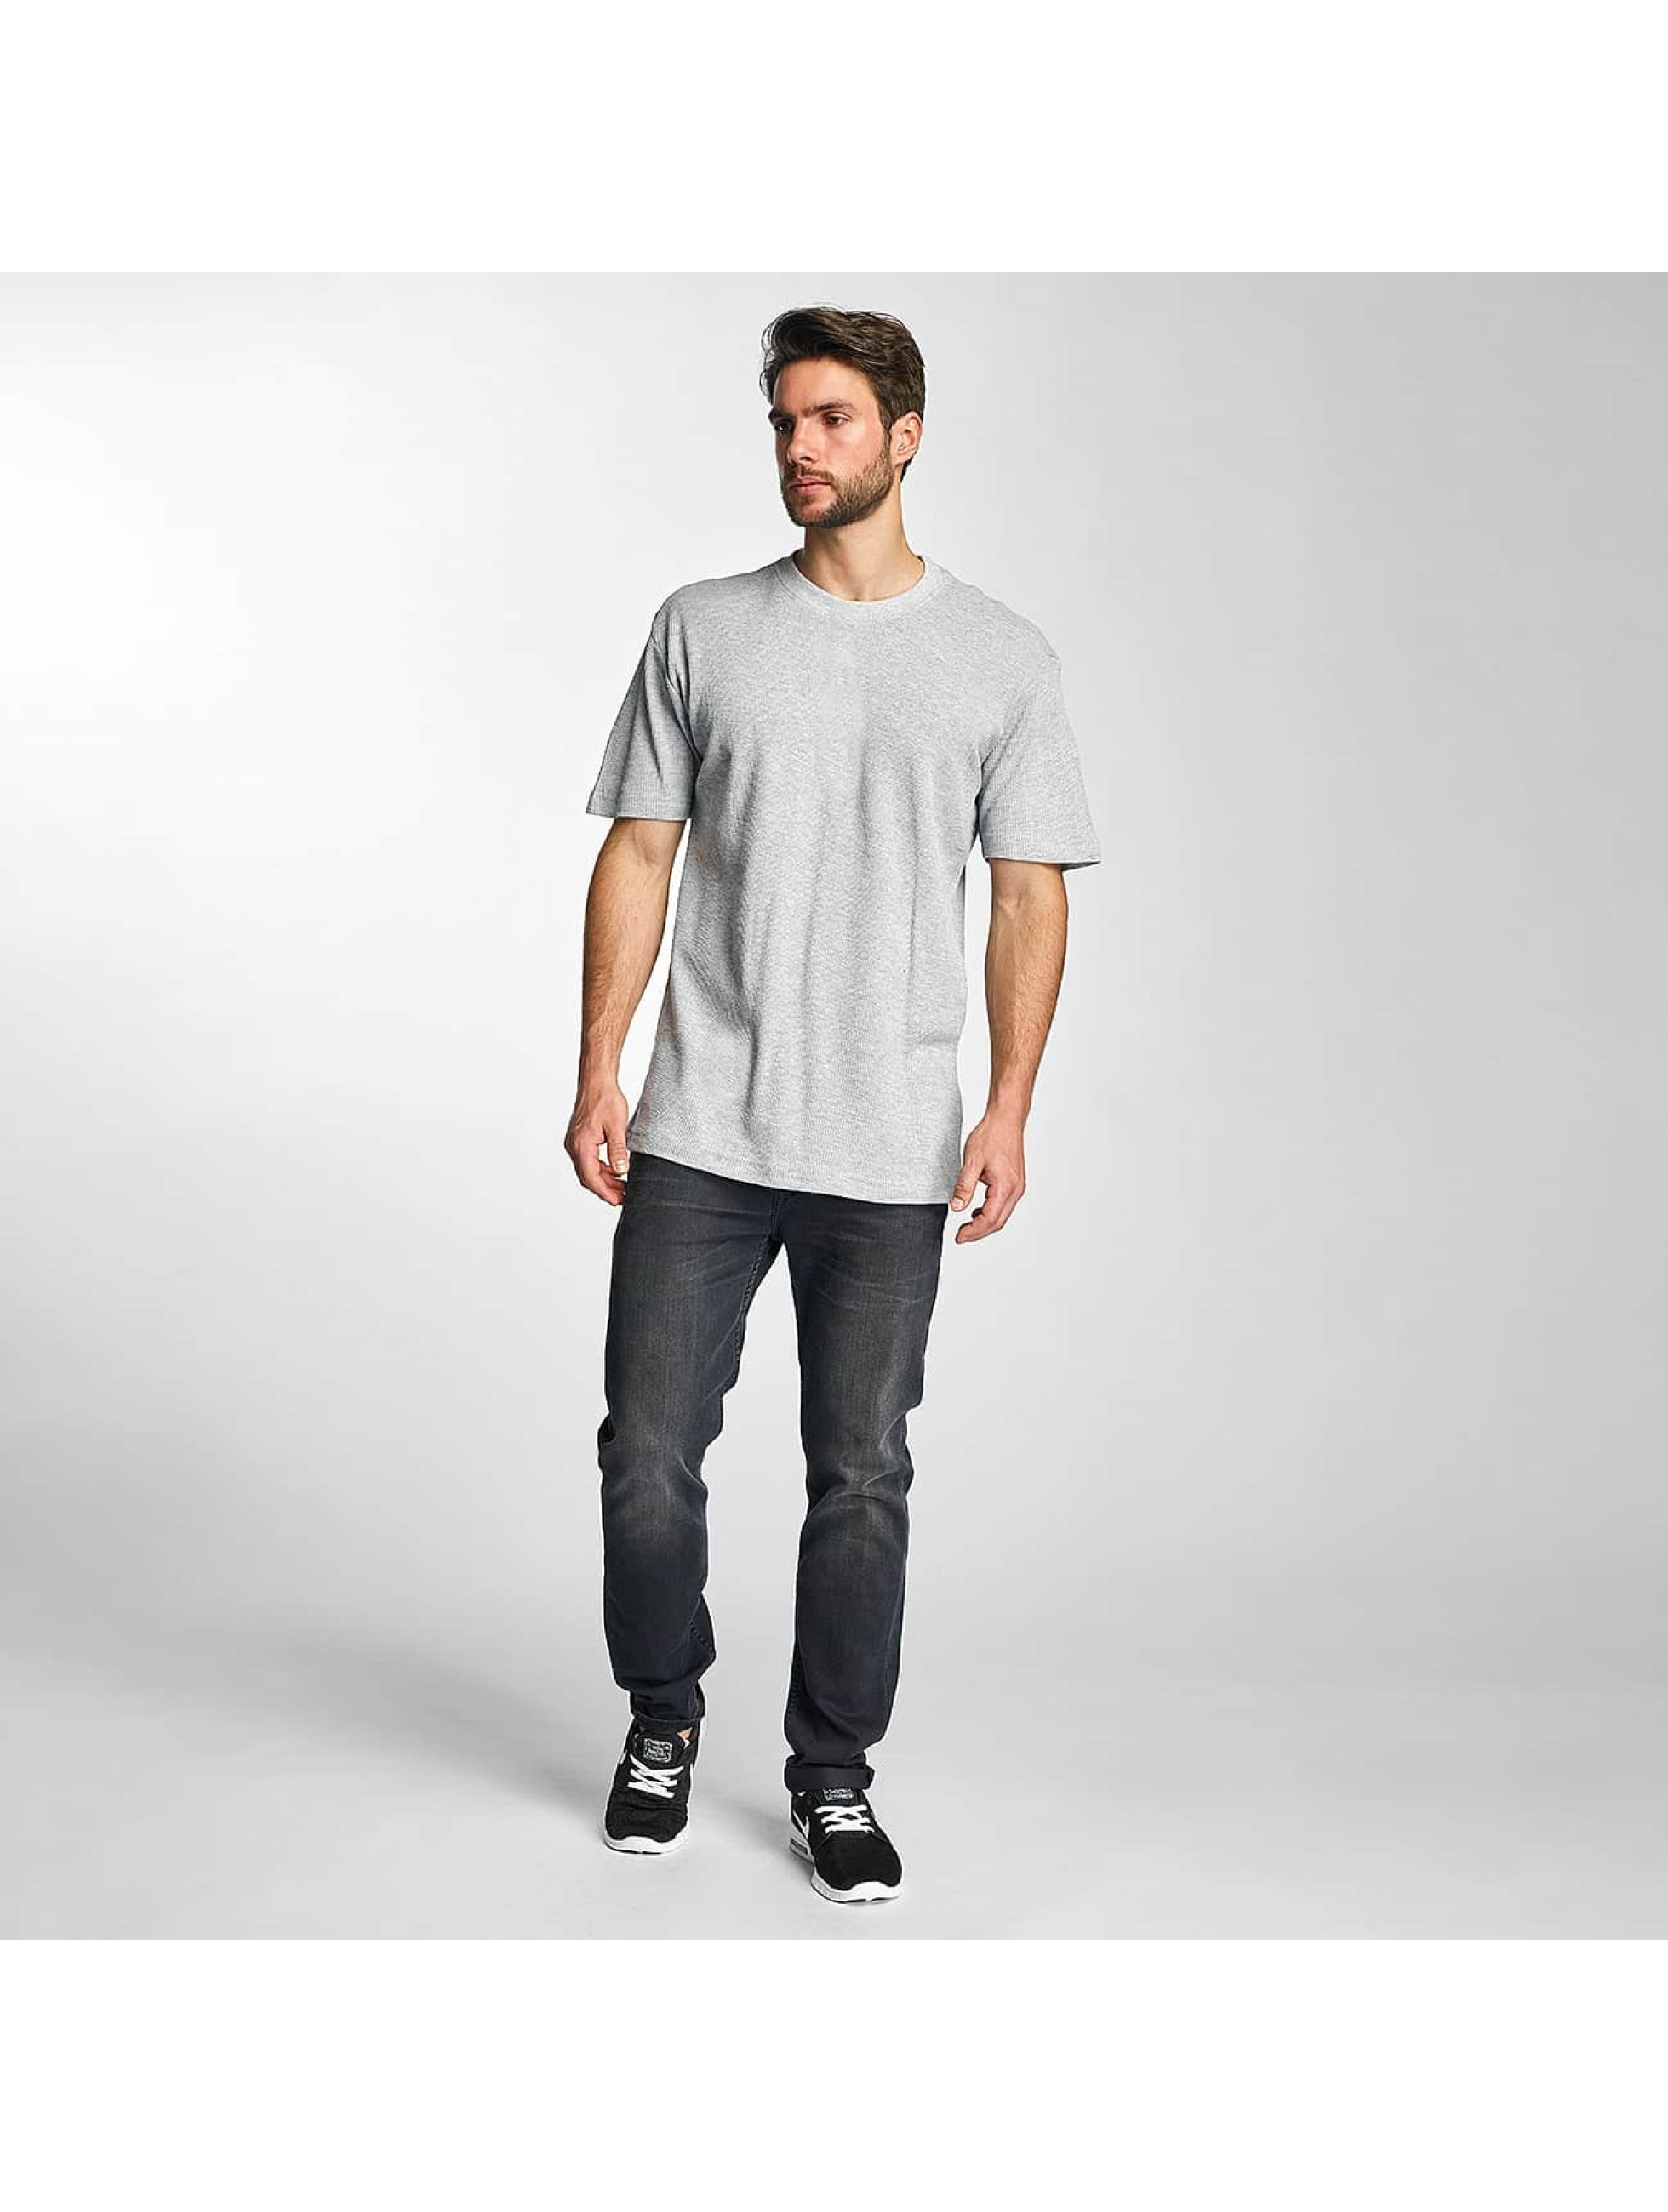 Urban Classics T-Shirt Thermal grey